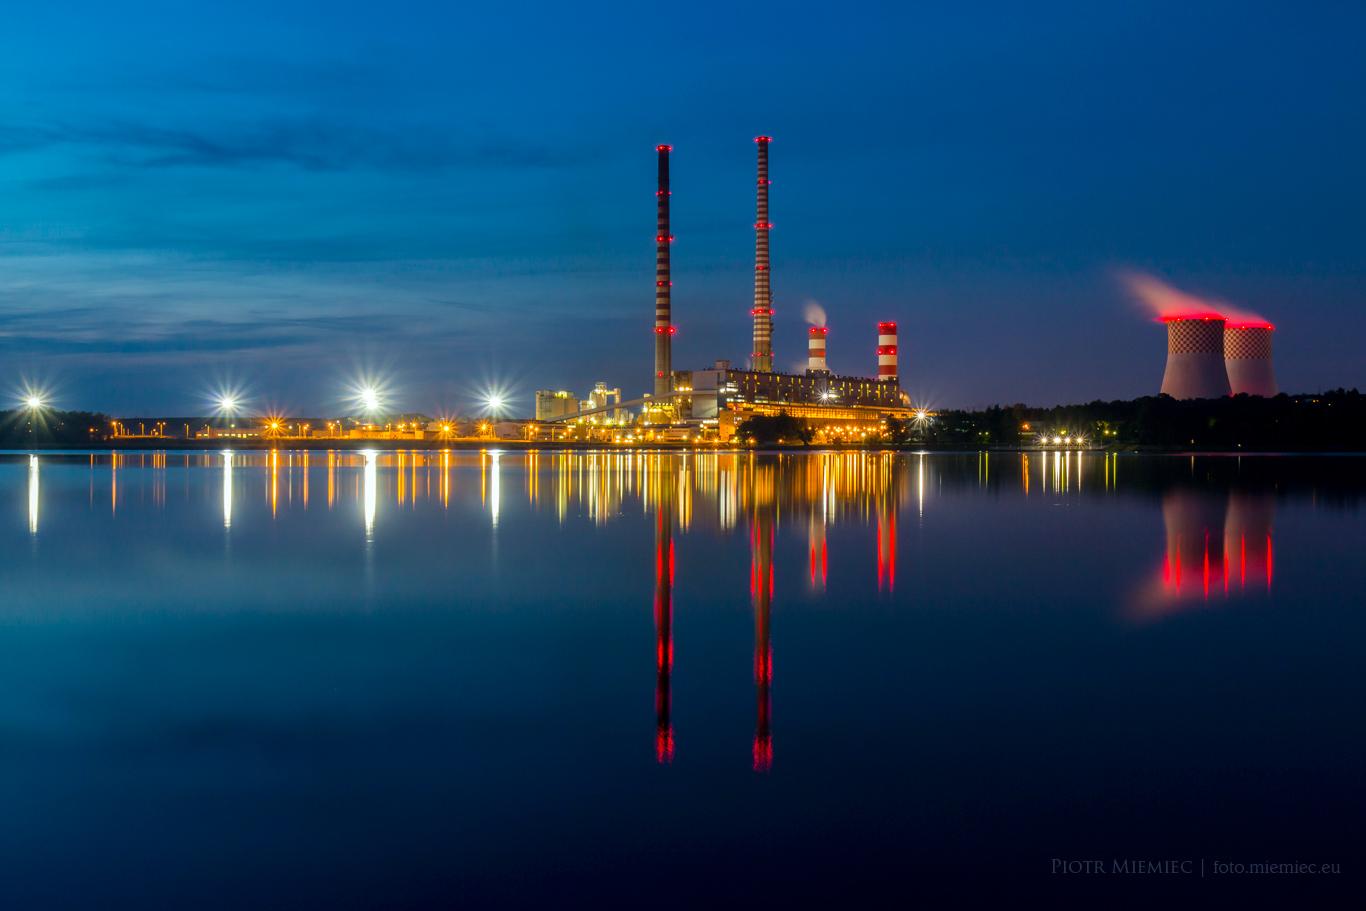 Elektrownia Rybnik IMG_7365